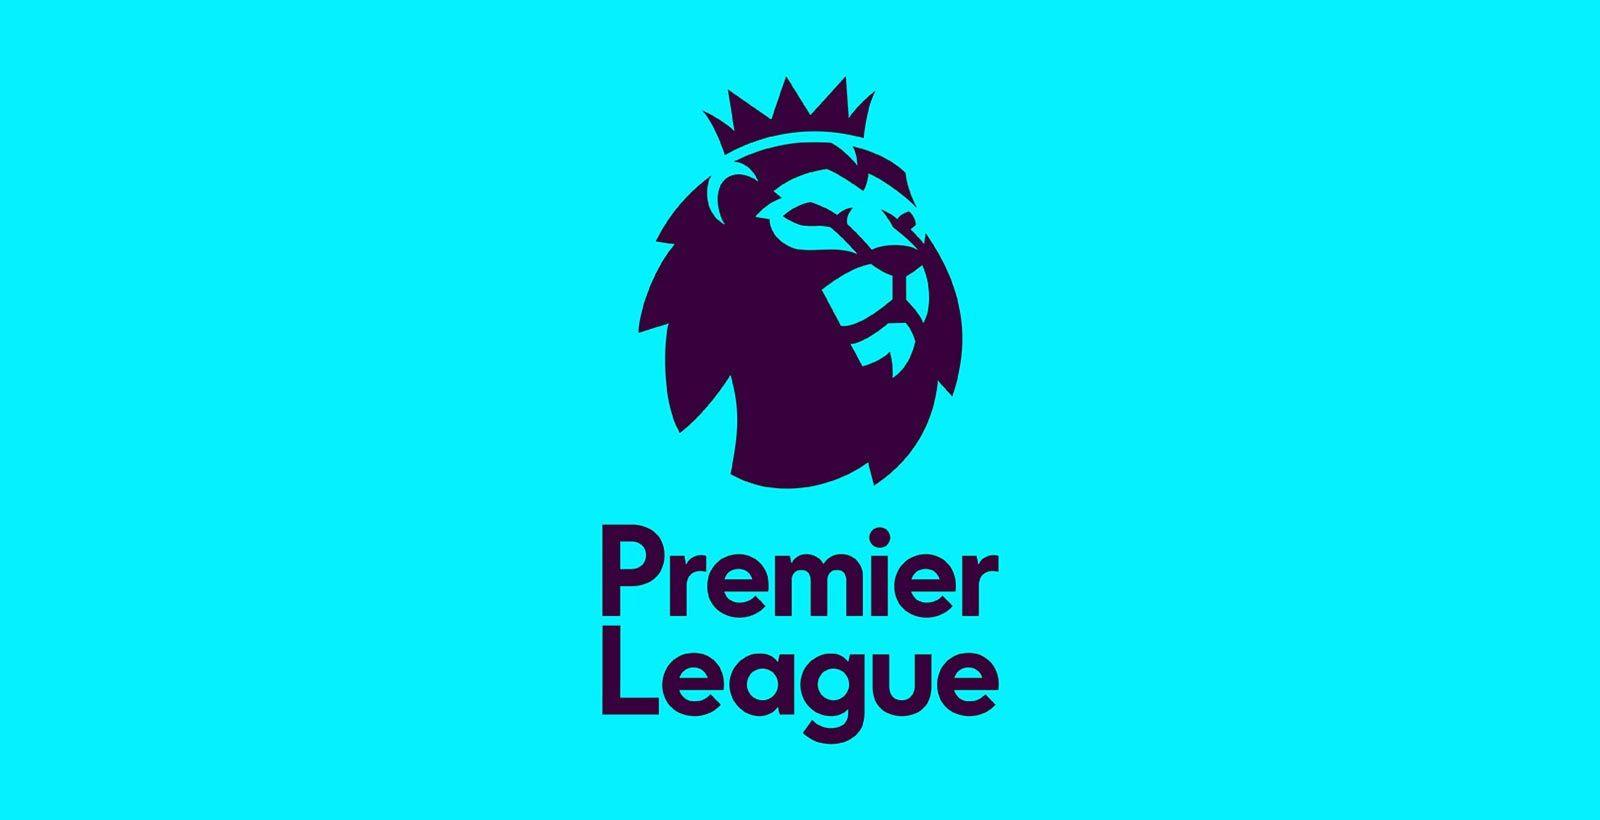 27/02/2021 Daily Predictions: English Premier League – Manchester City vs West Ham